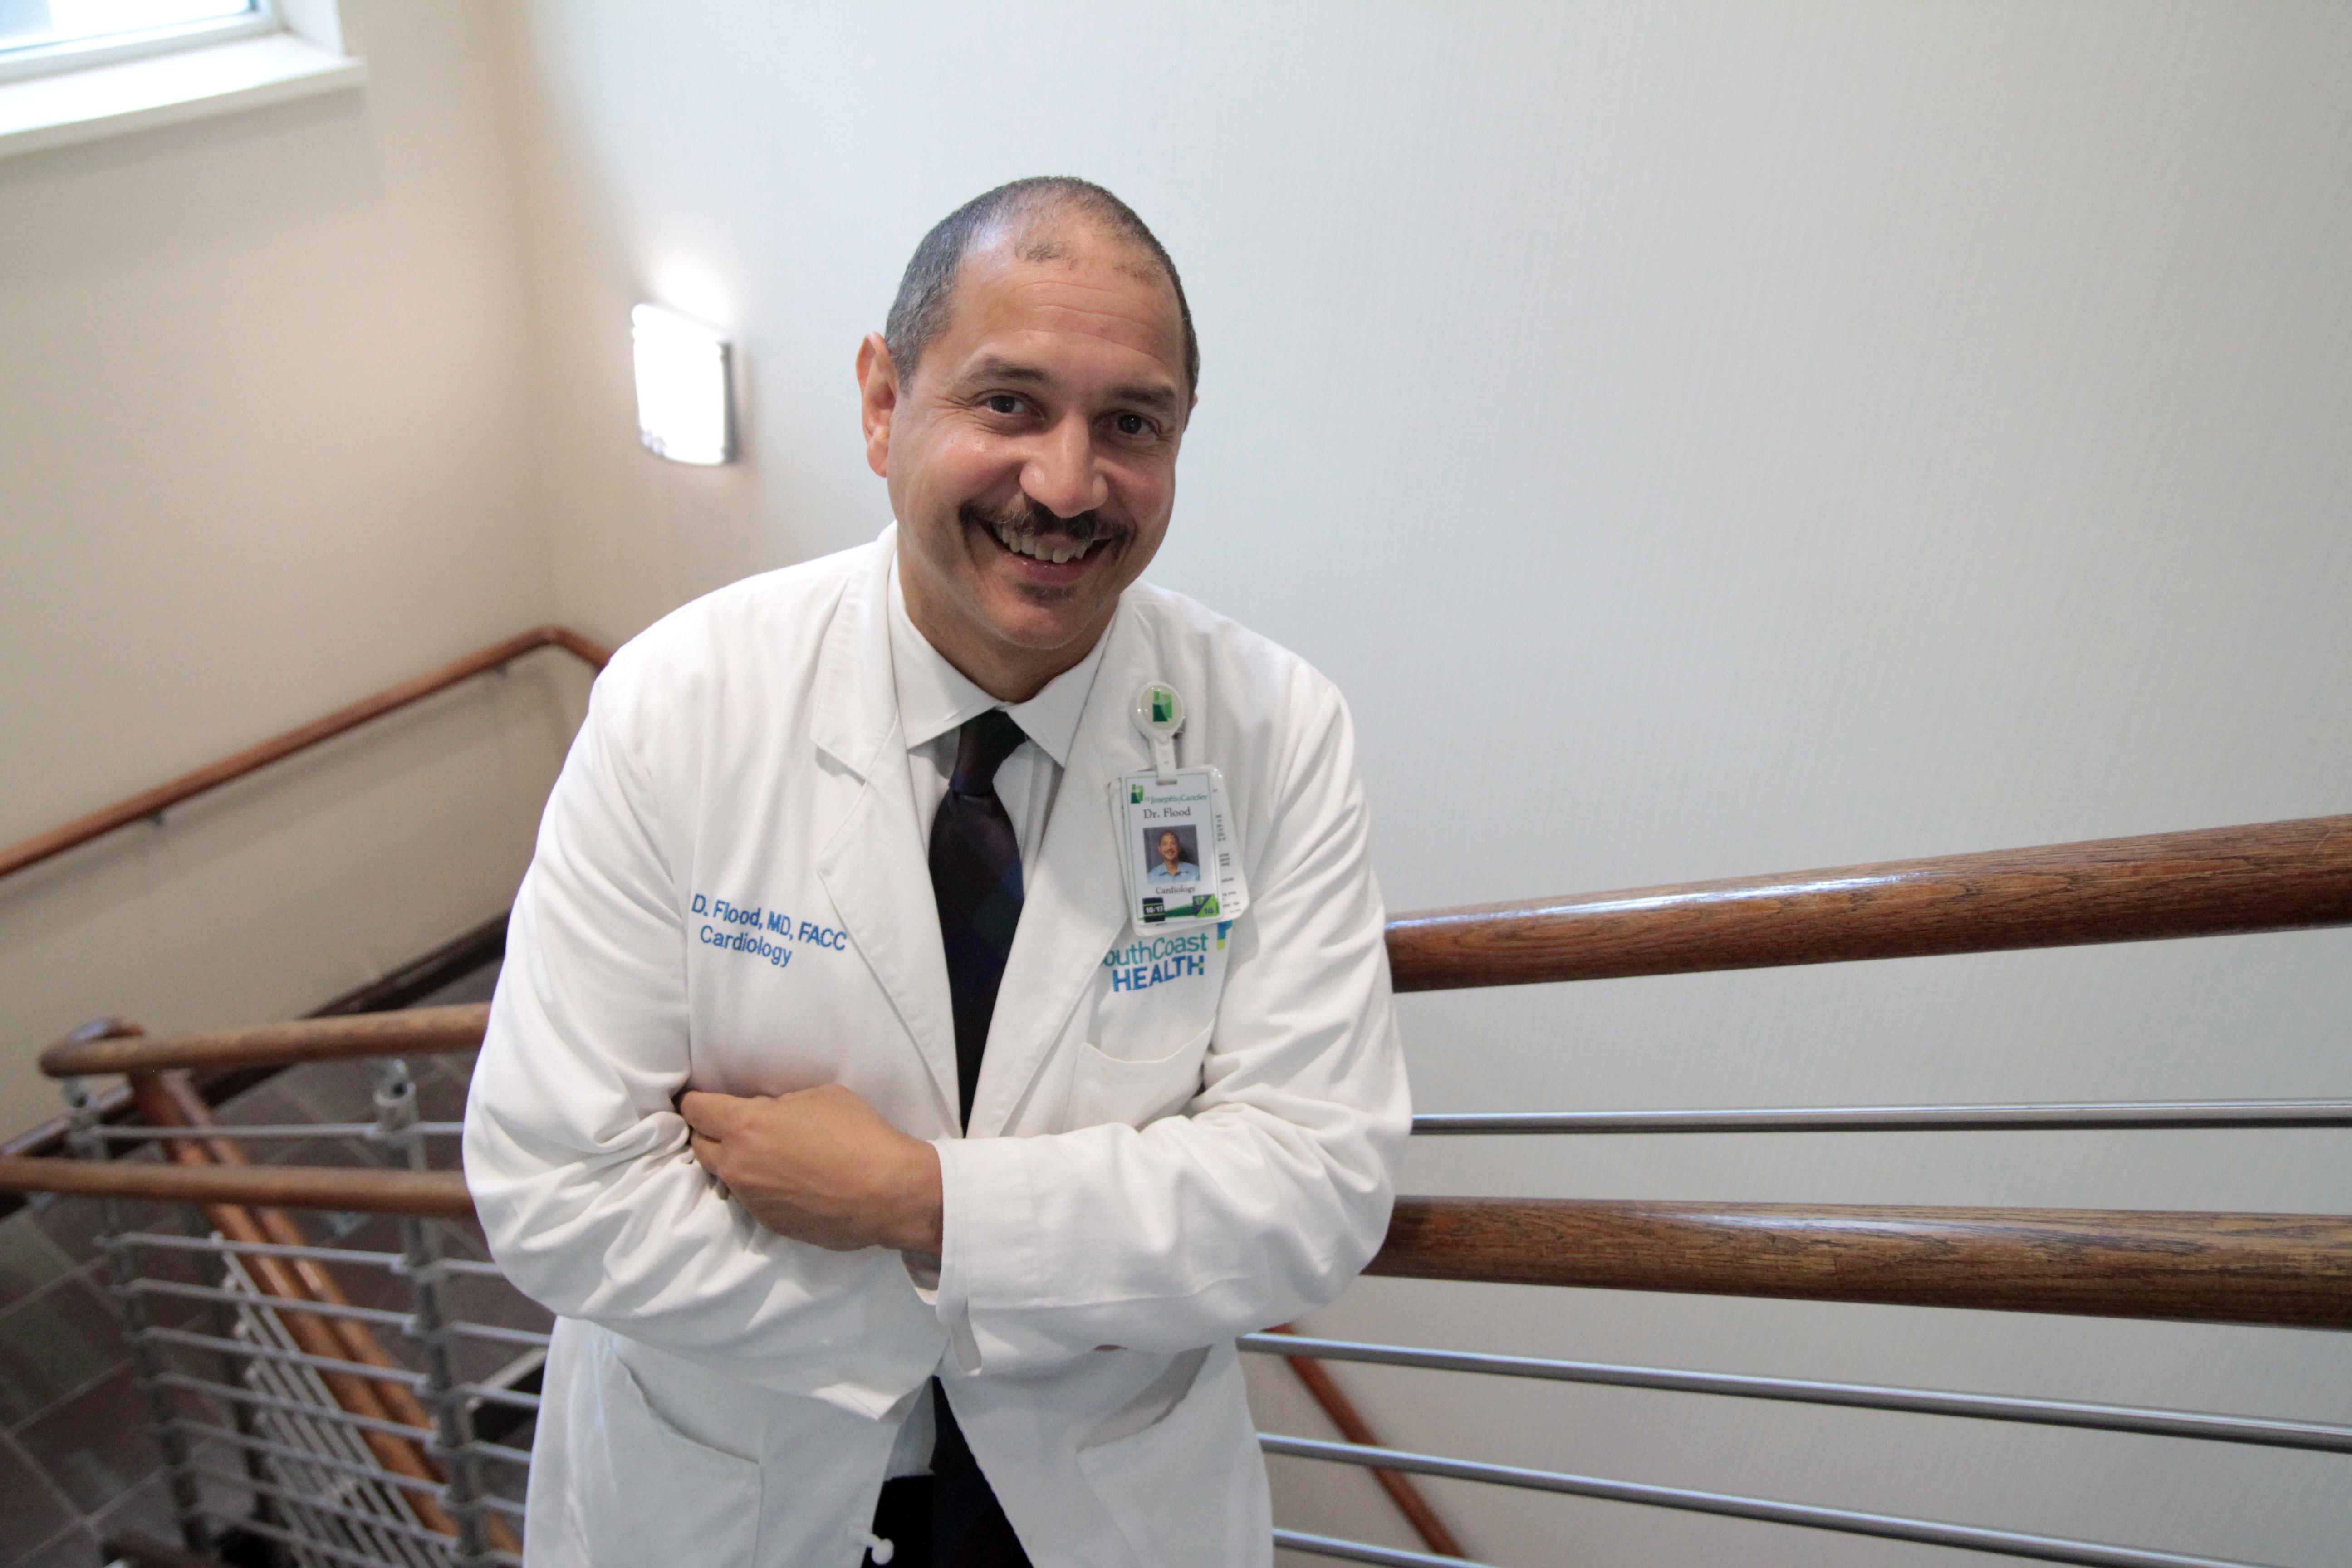 SouthCoast Health - Cardiology